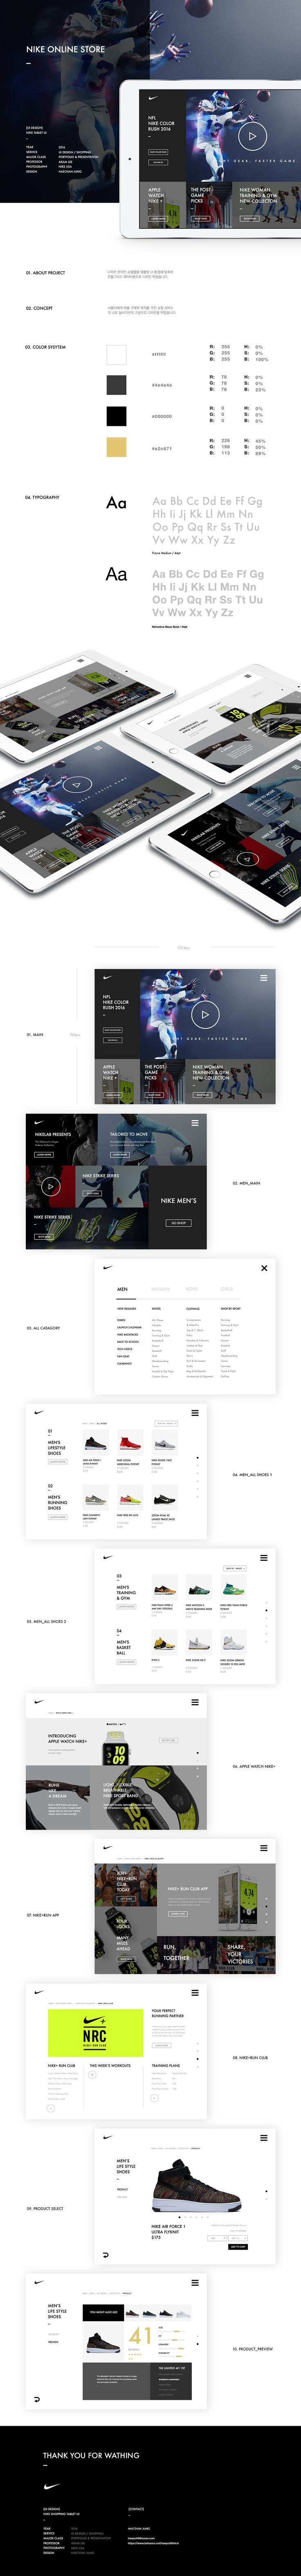 [UI Design] Nike Online store Tablet on Behance